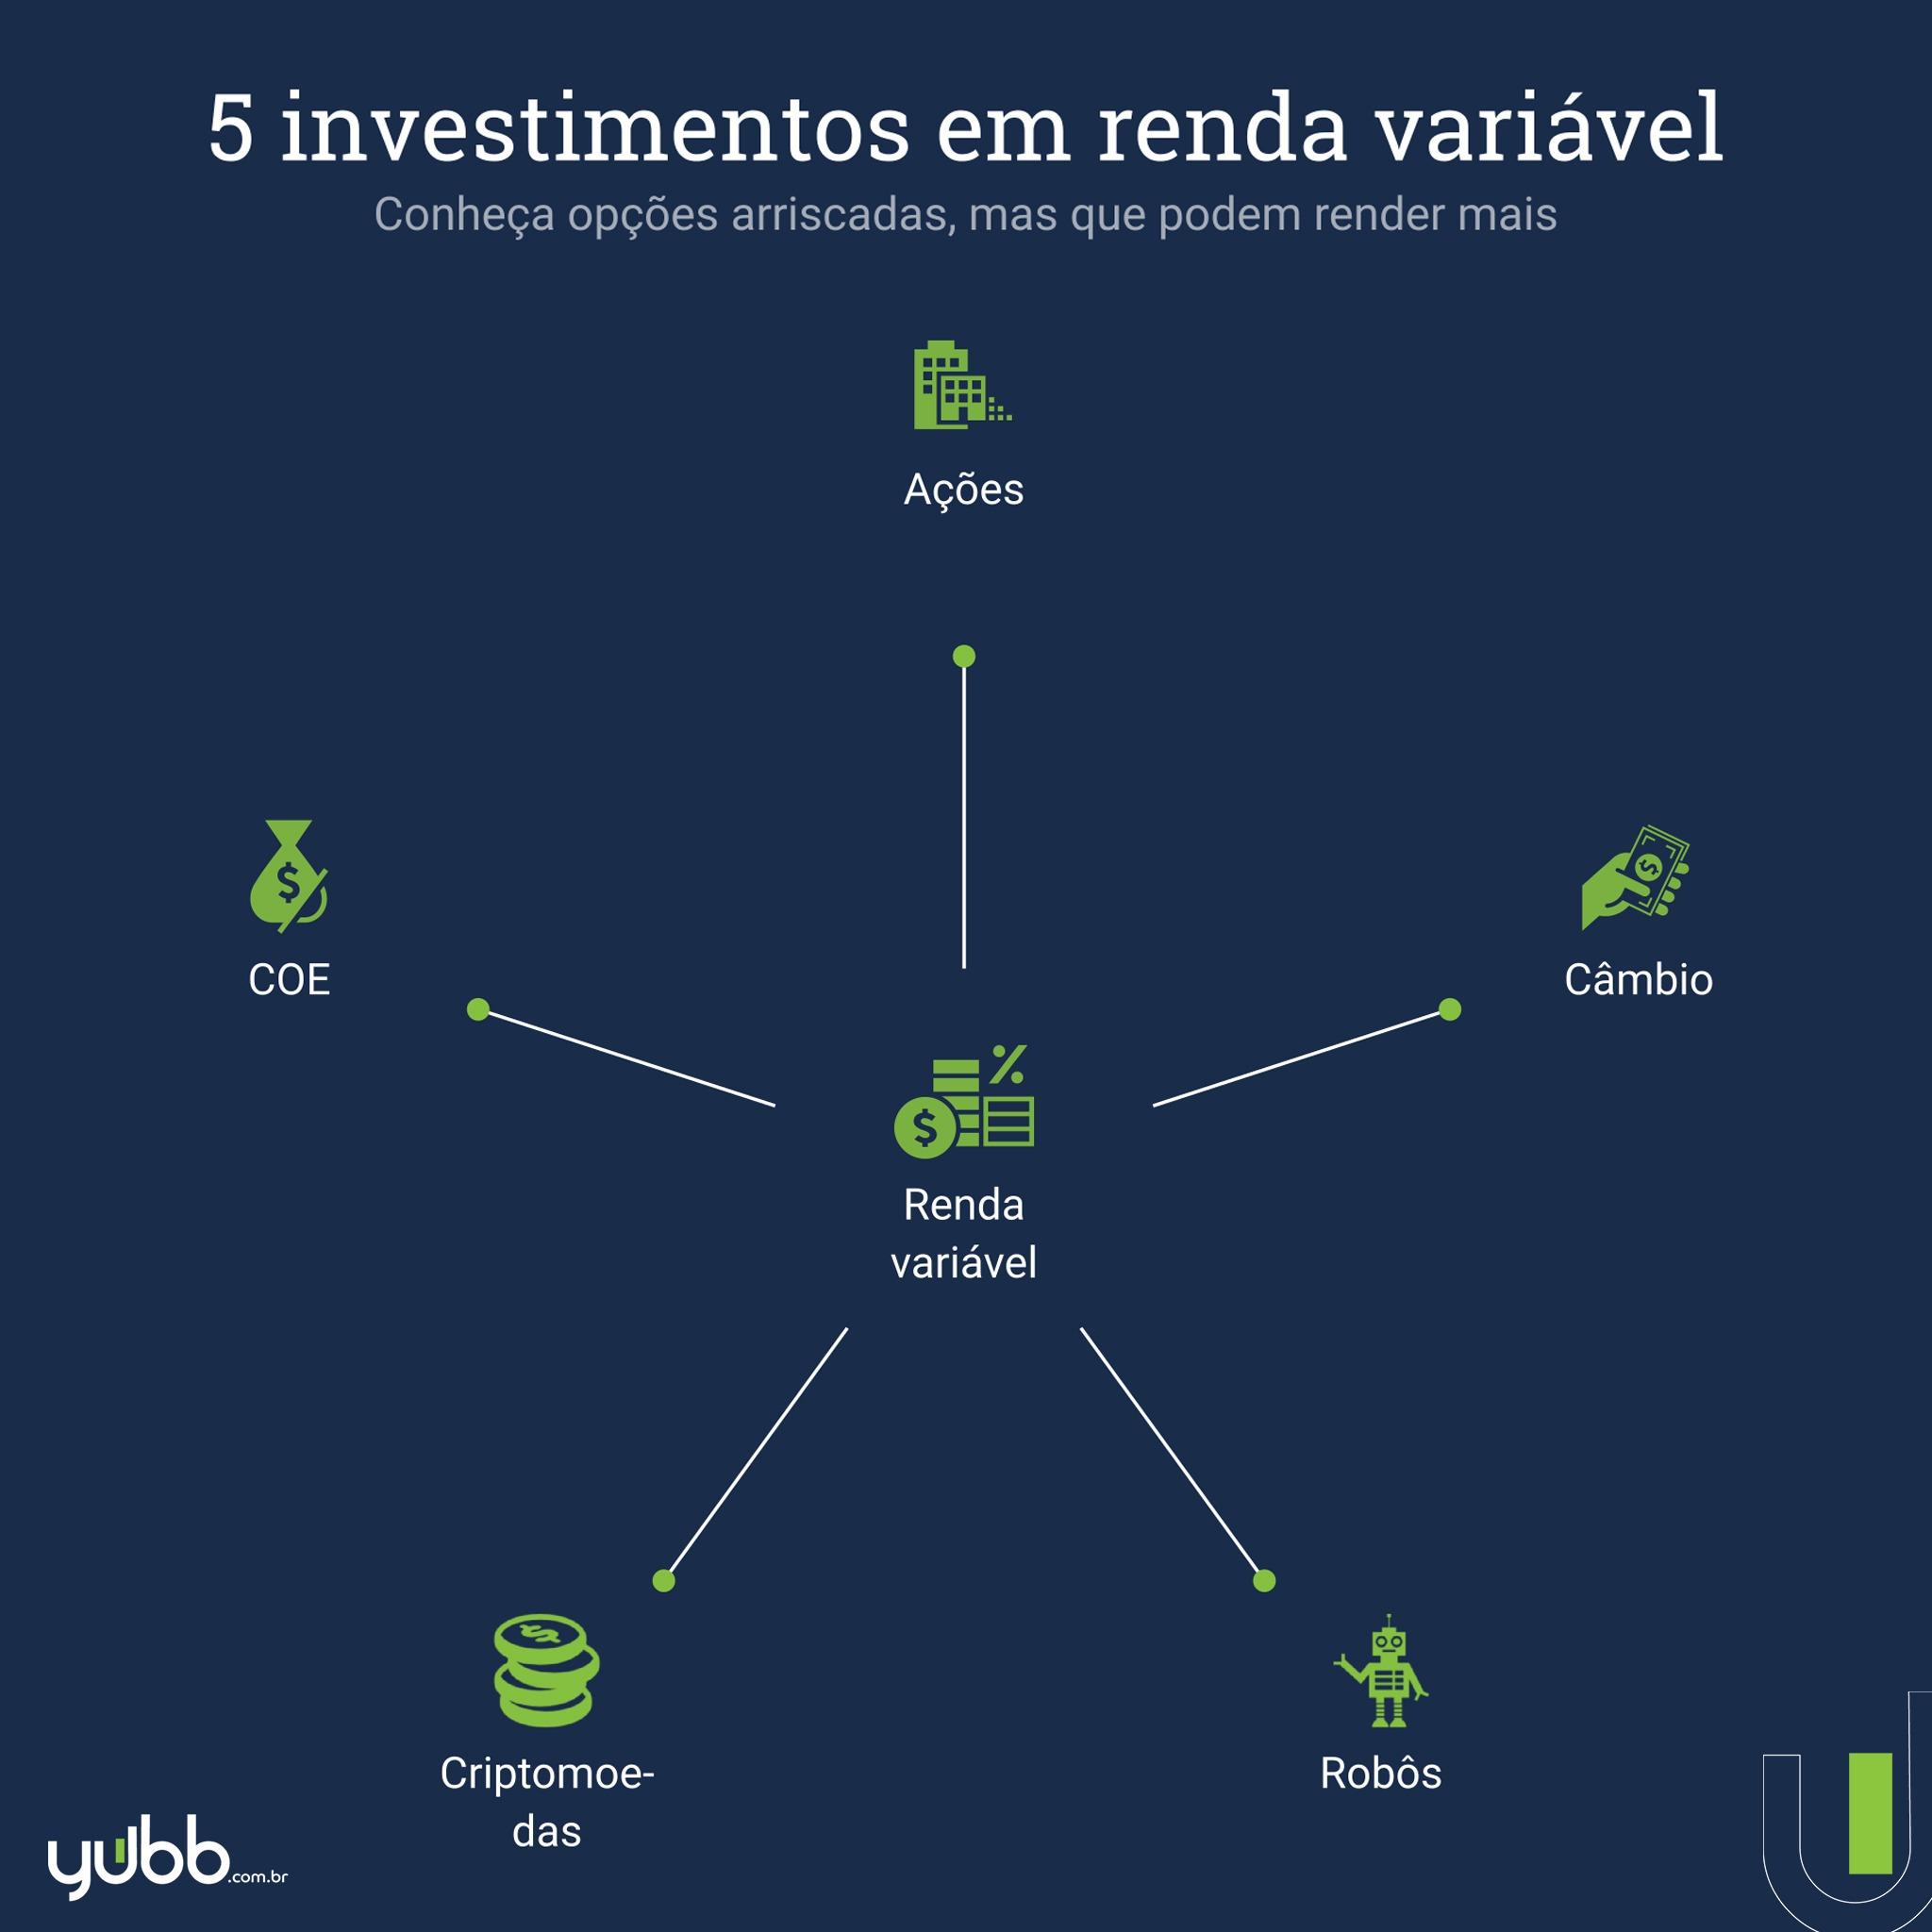 investimentos em renda variável